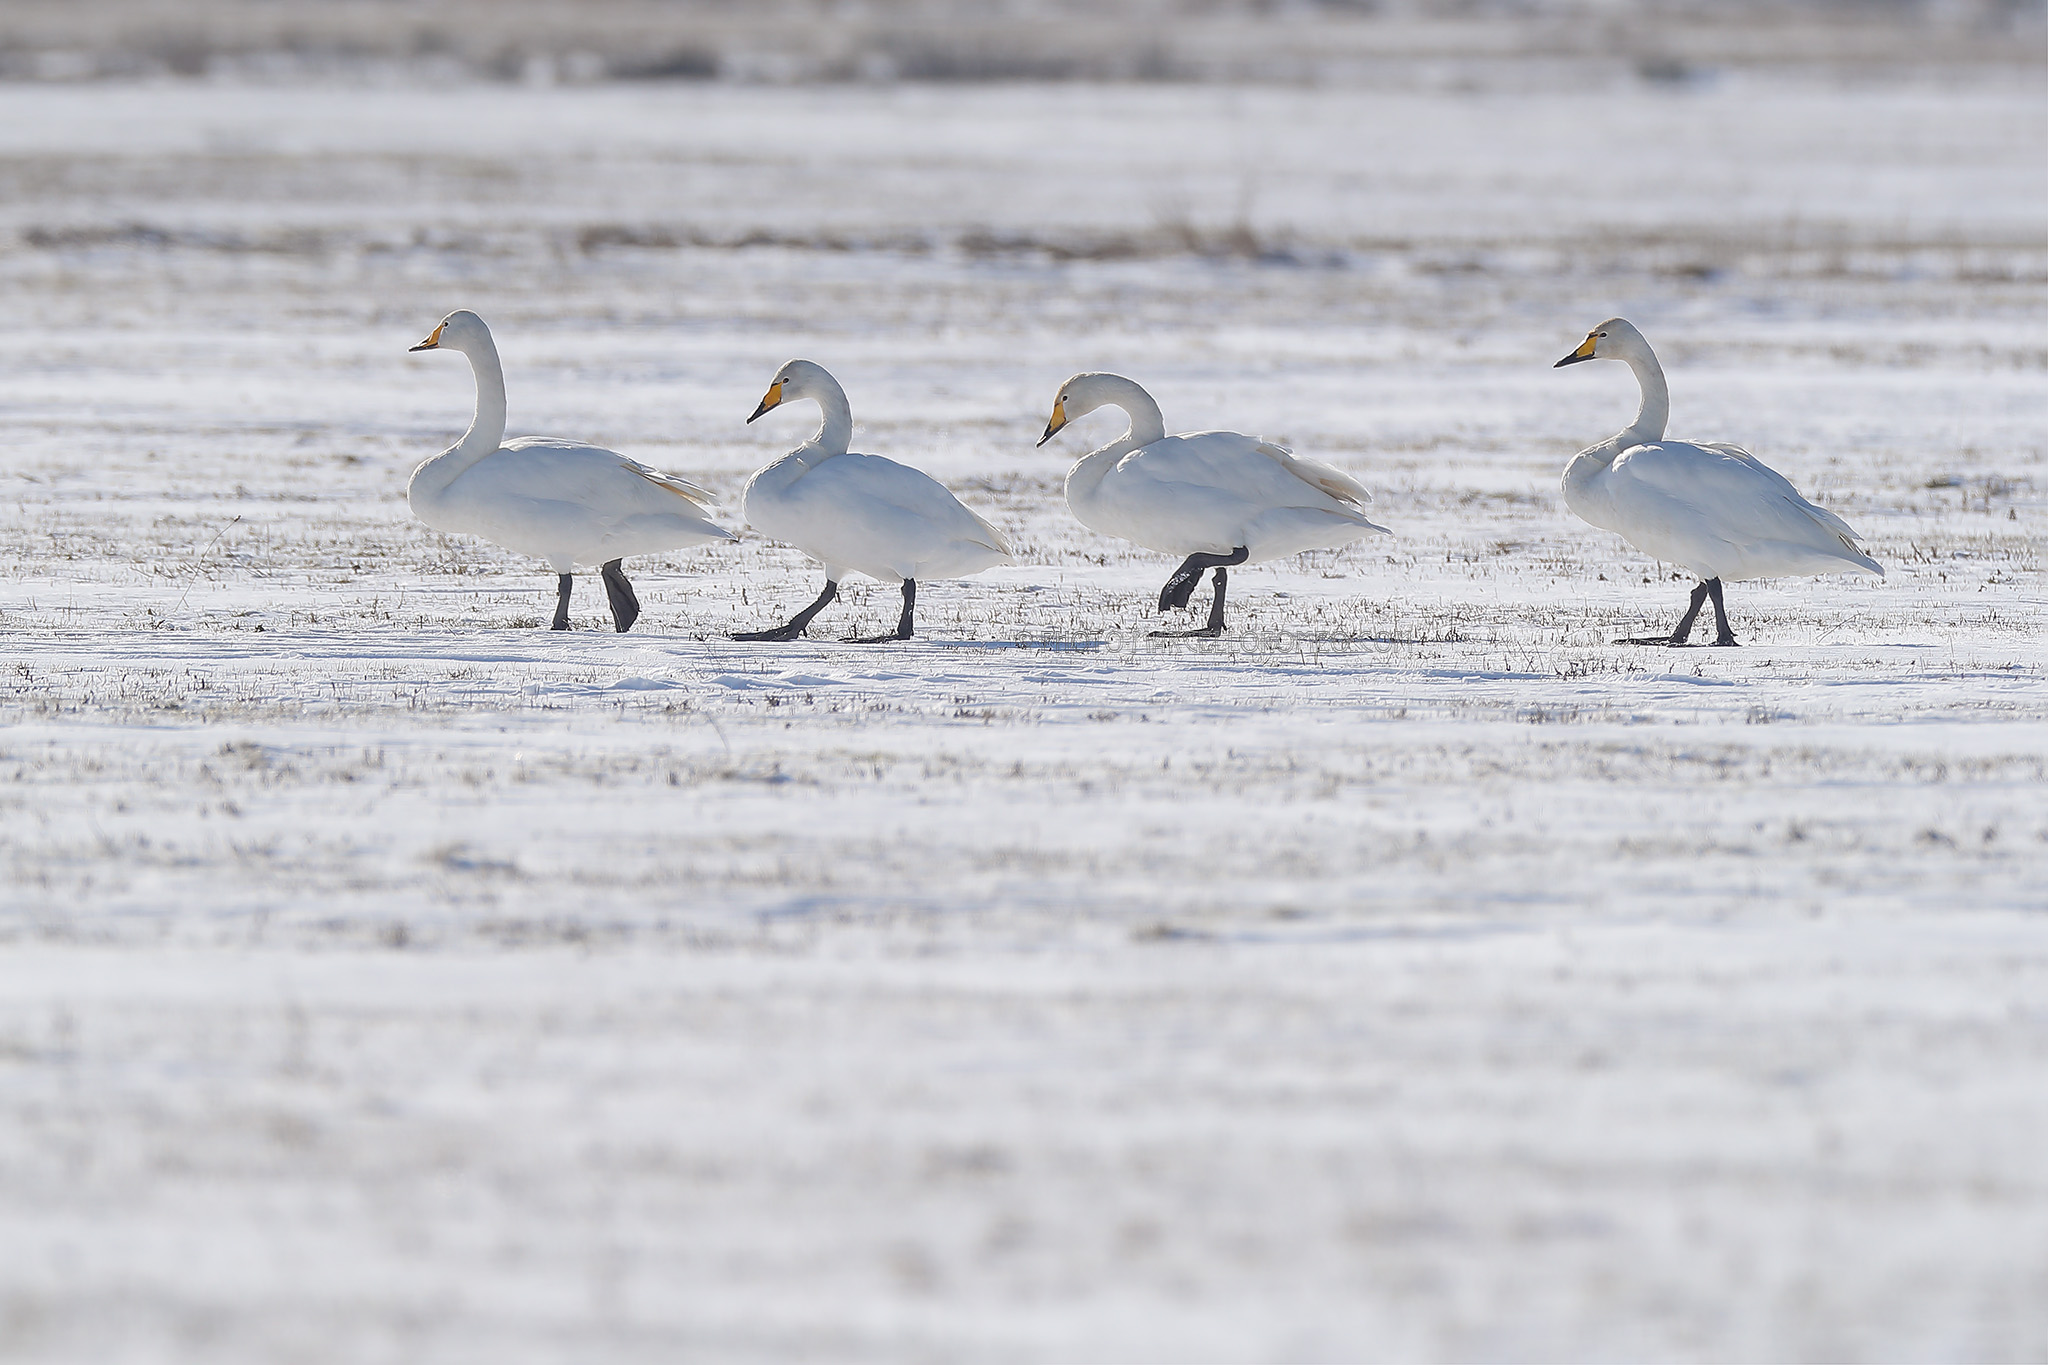 Wilde Zwaan; Whooper Swan; Cygnus Cygnus